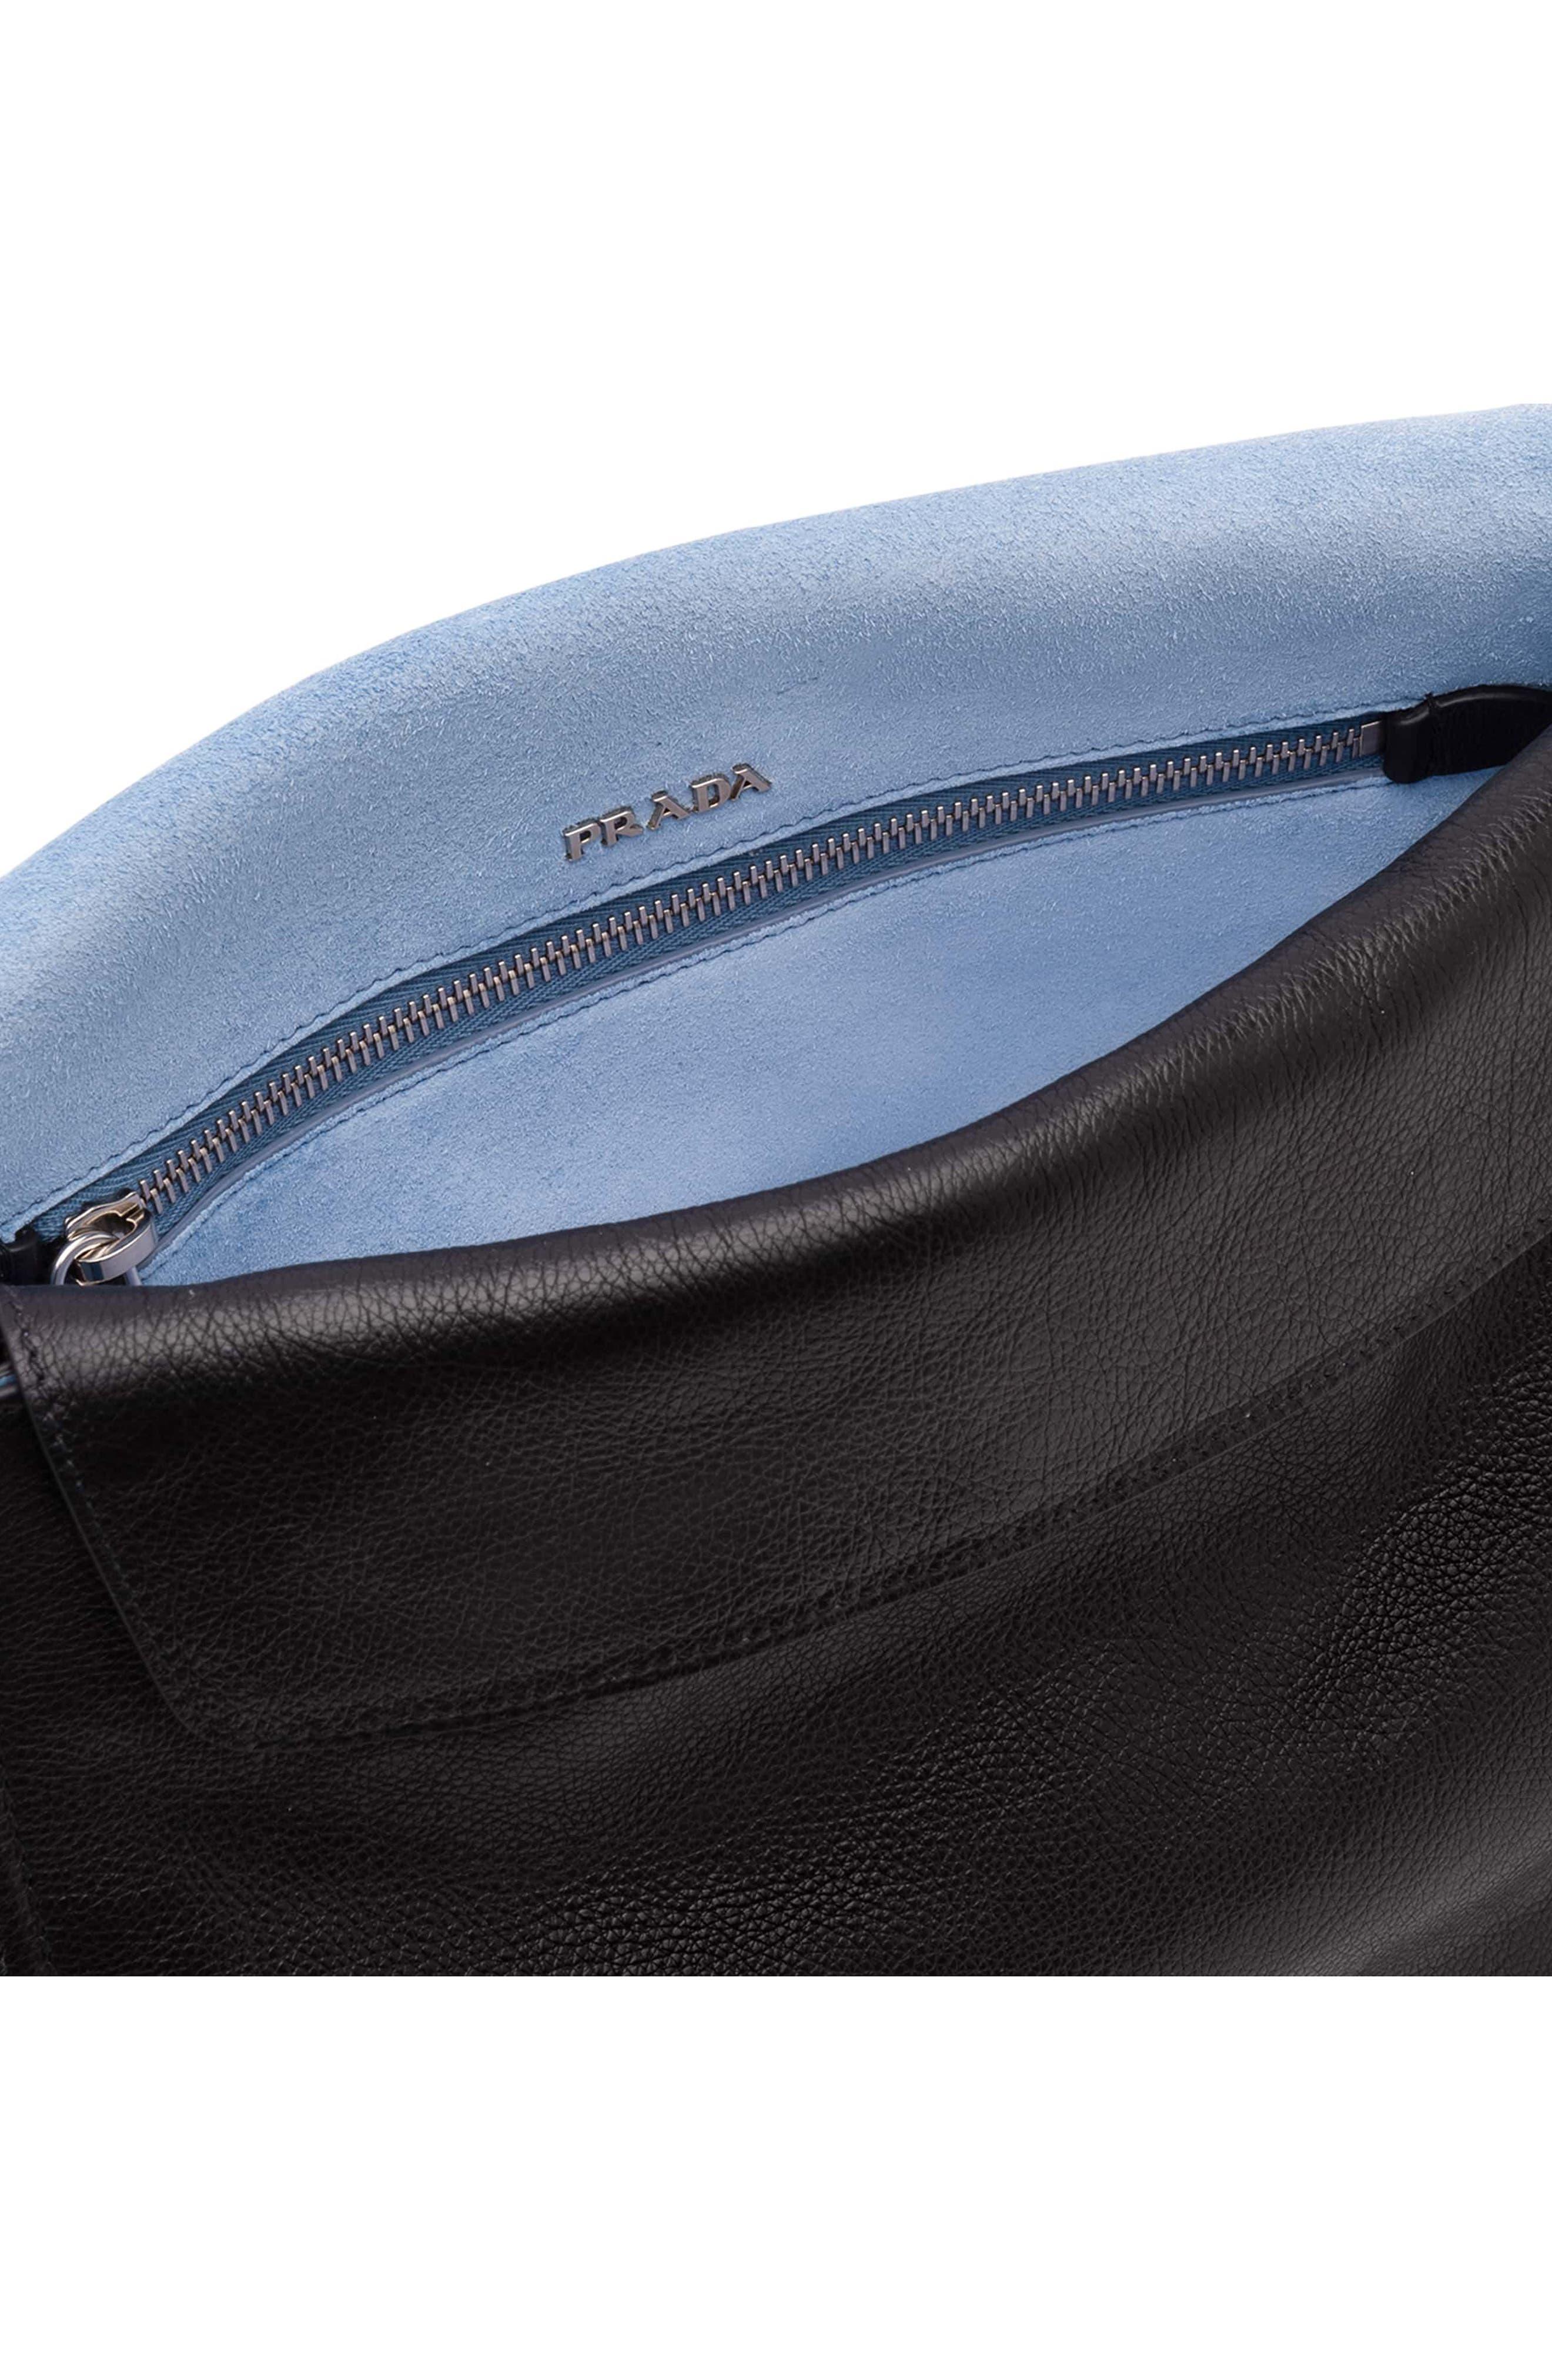 Cahier Glace Messenger Bag,                             Alternate thumbnail 4, color,